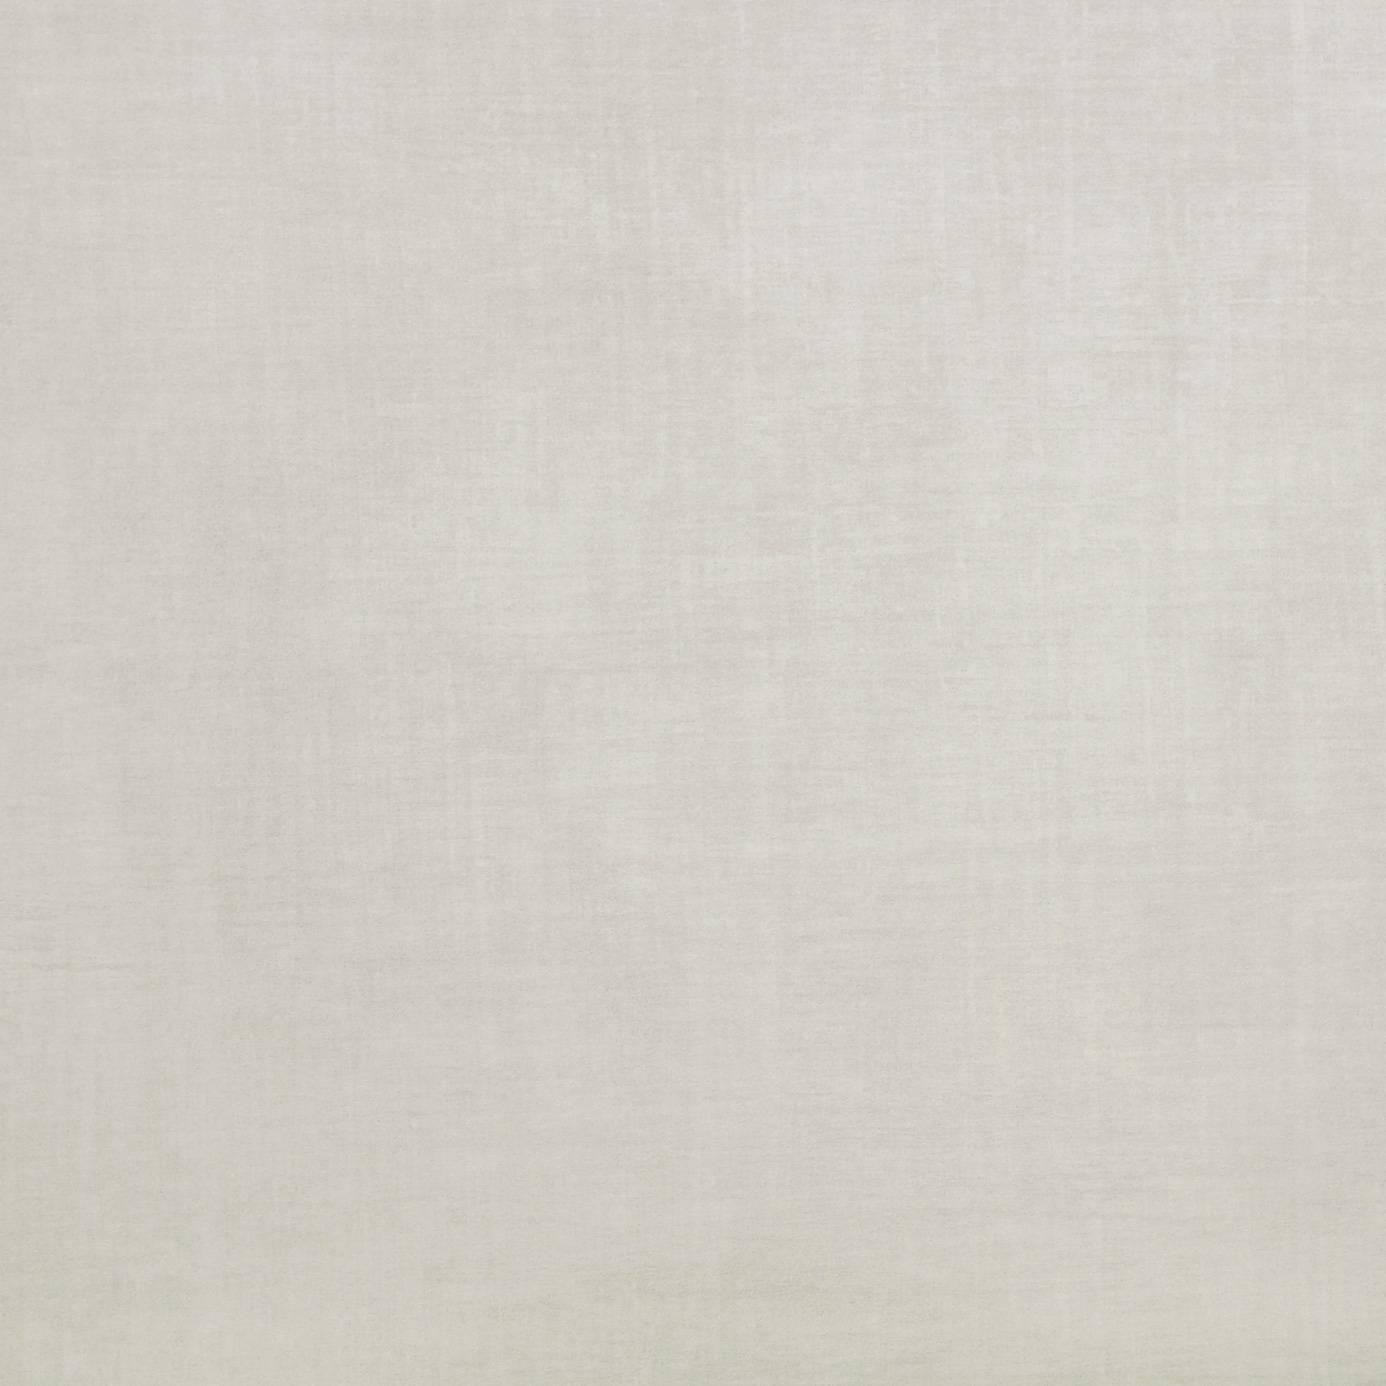 Французские обои Casadeco,  коллекция So White 2, артикулSWI64669009